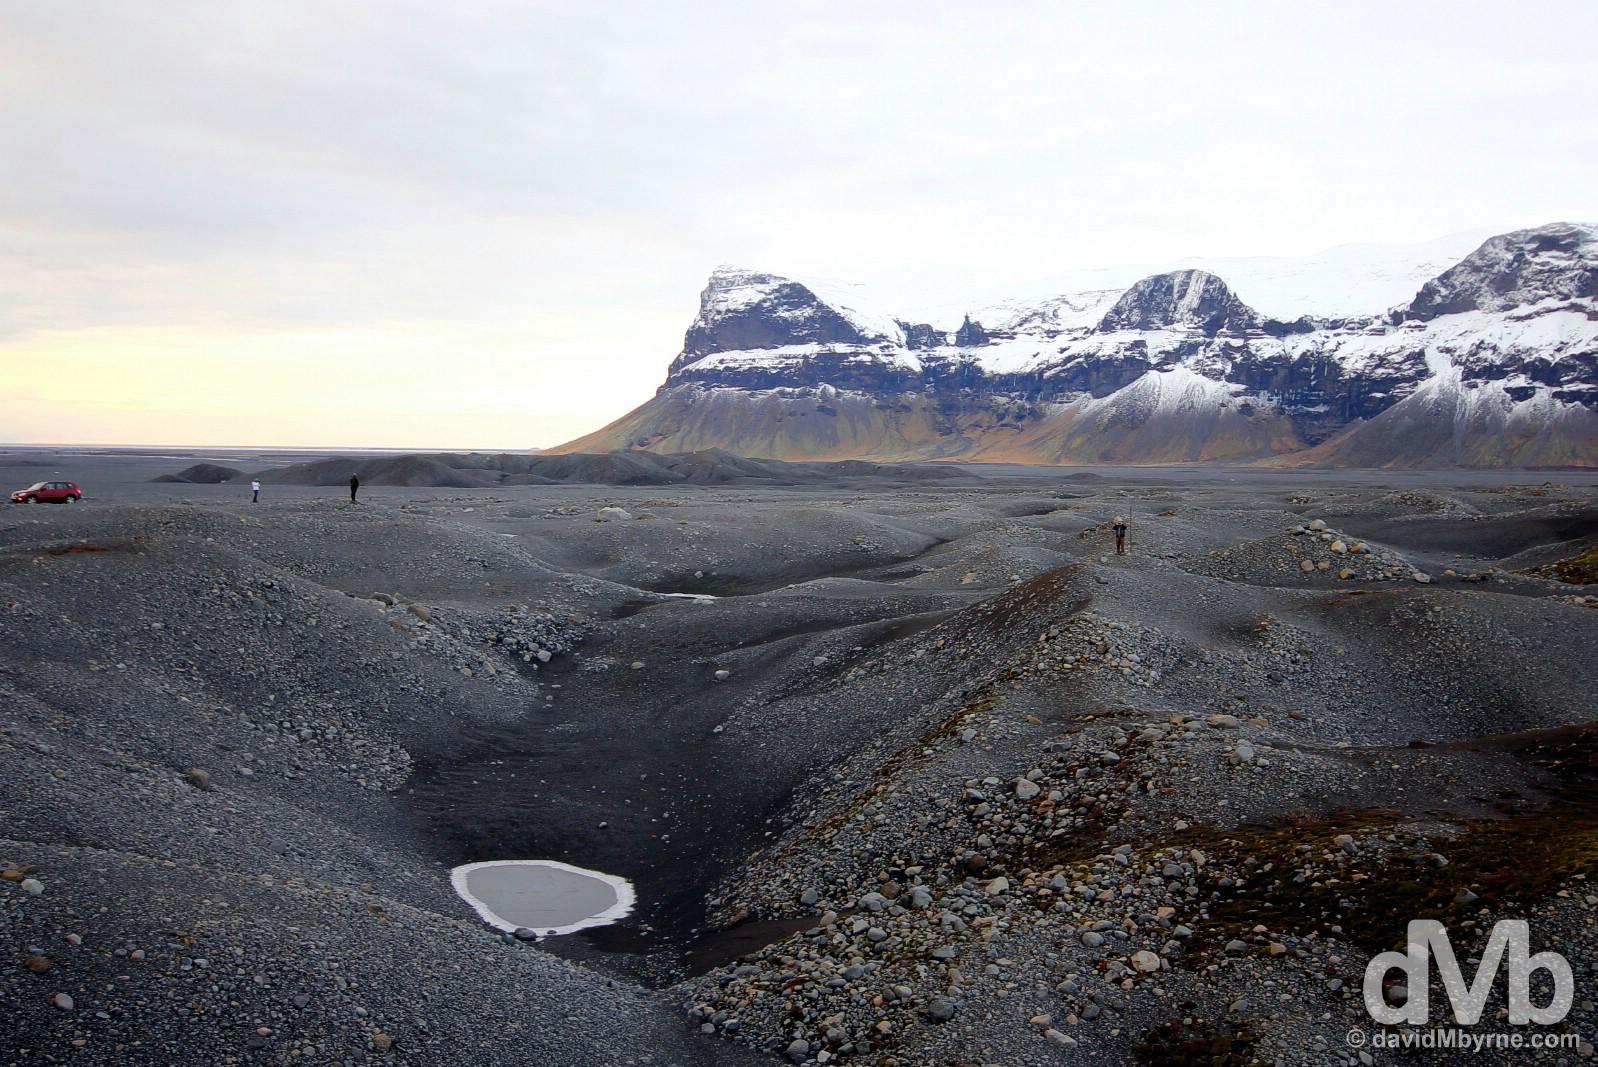 Surveying the desolation at Mýrdalssandur, southern Iceland. December 4, 2012.